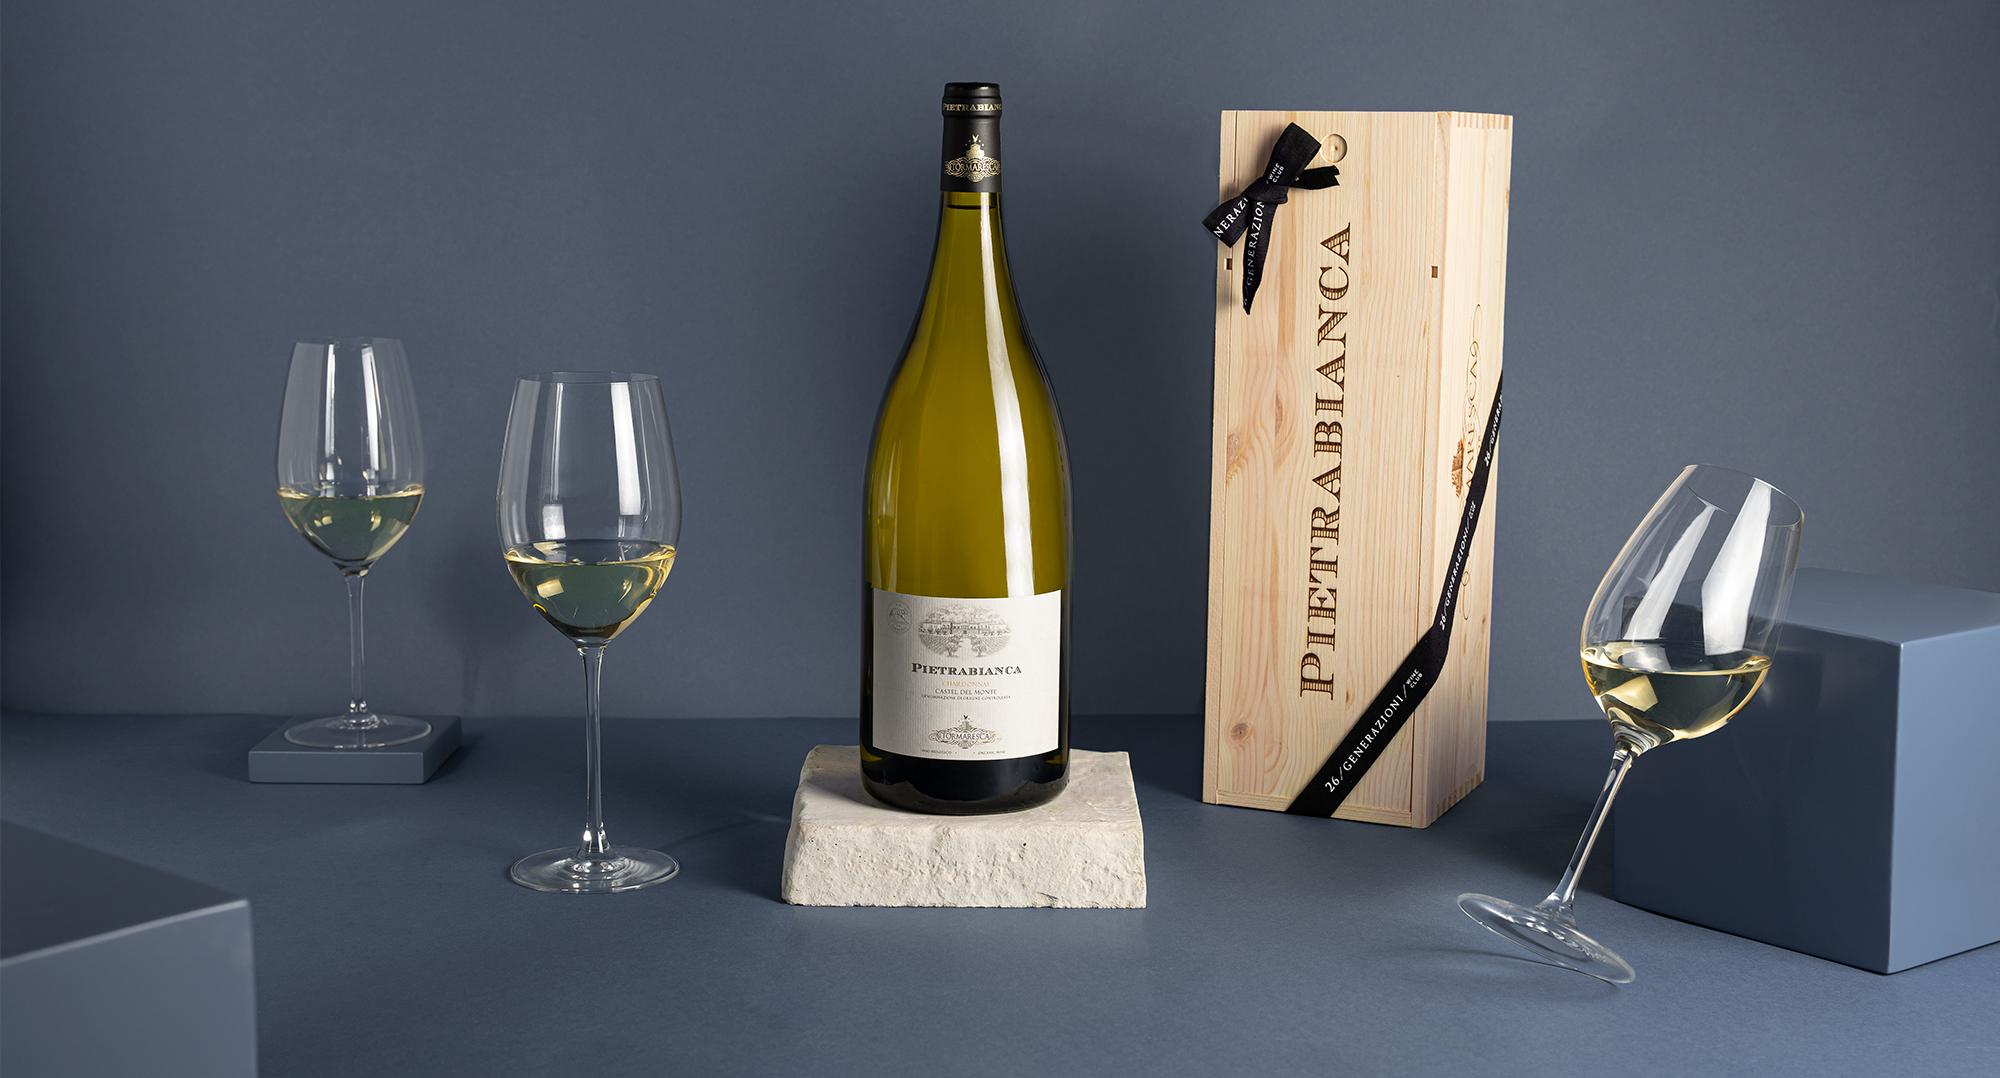 Passione Chardonnay